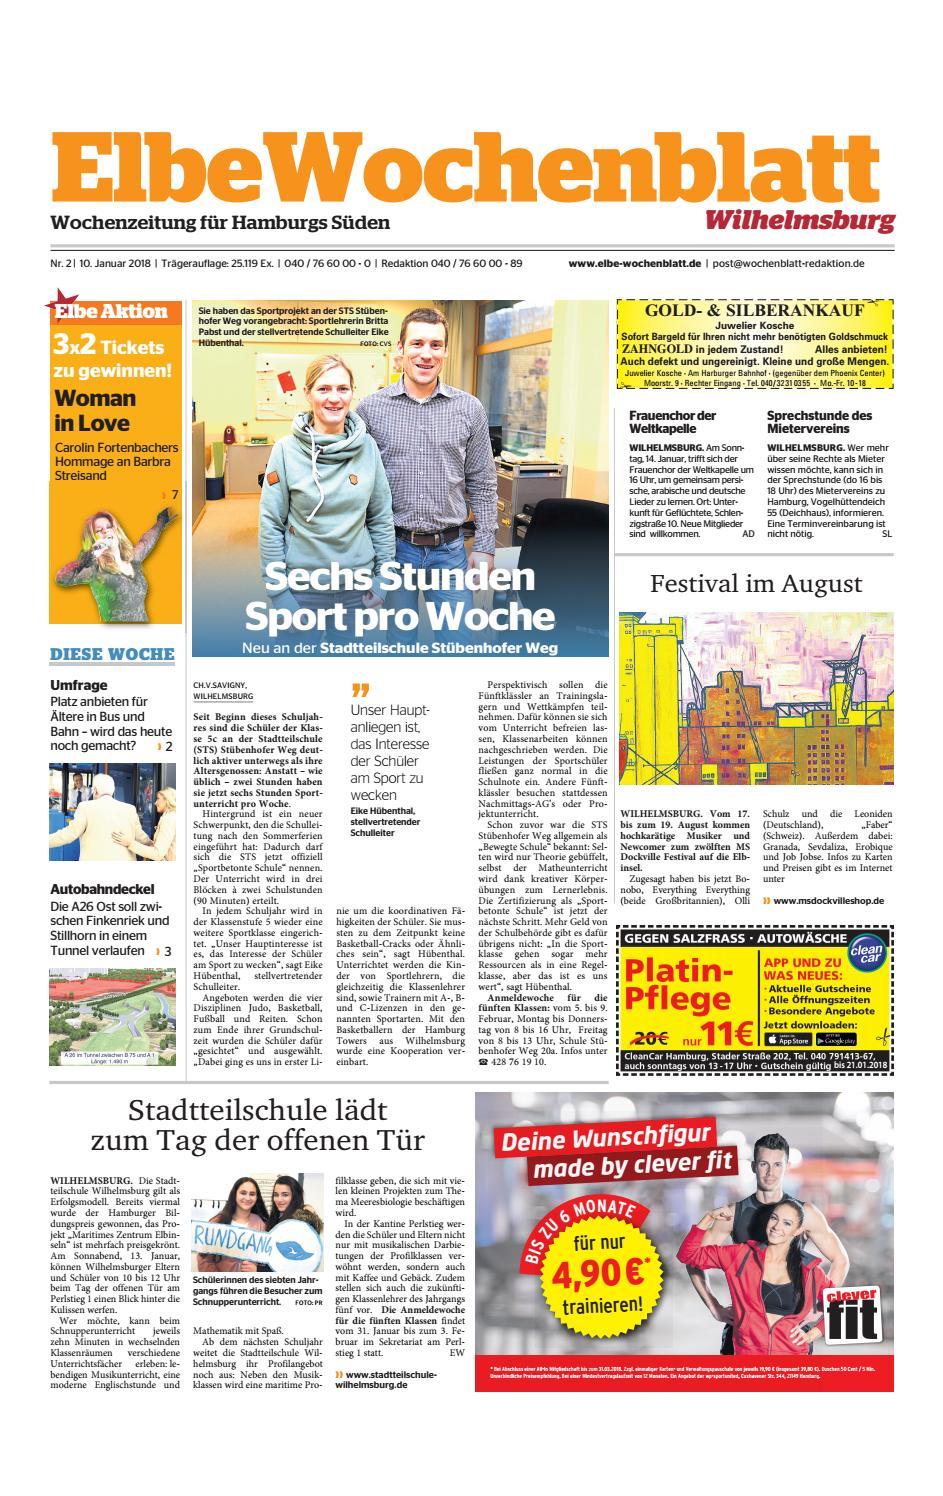 Wilhelmsburg KW02 2018 by Elbe Wochenblatt Verlagsgesellschaft mbH & Co KG issuu